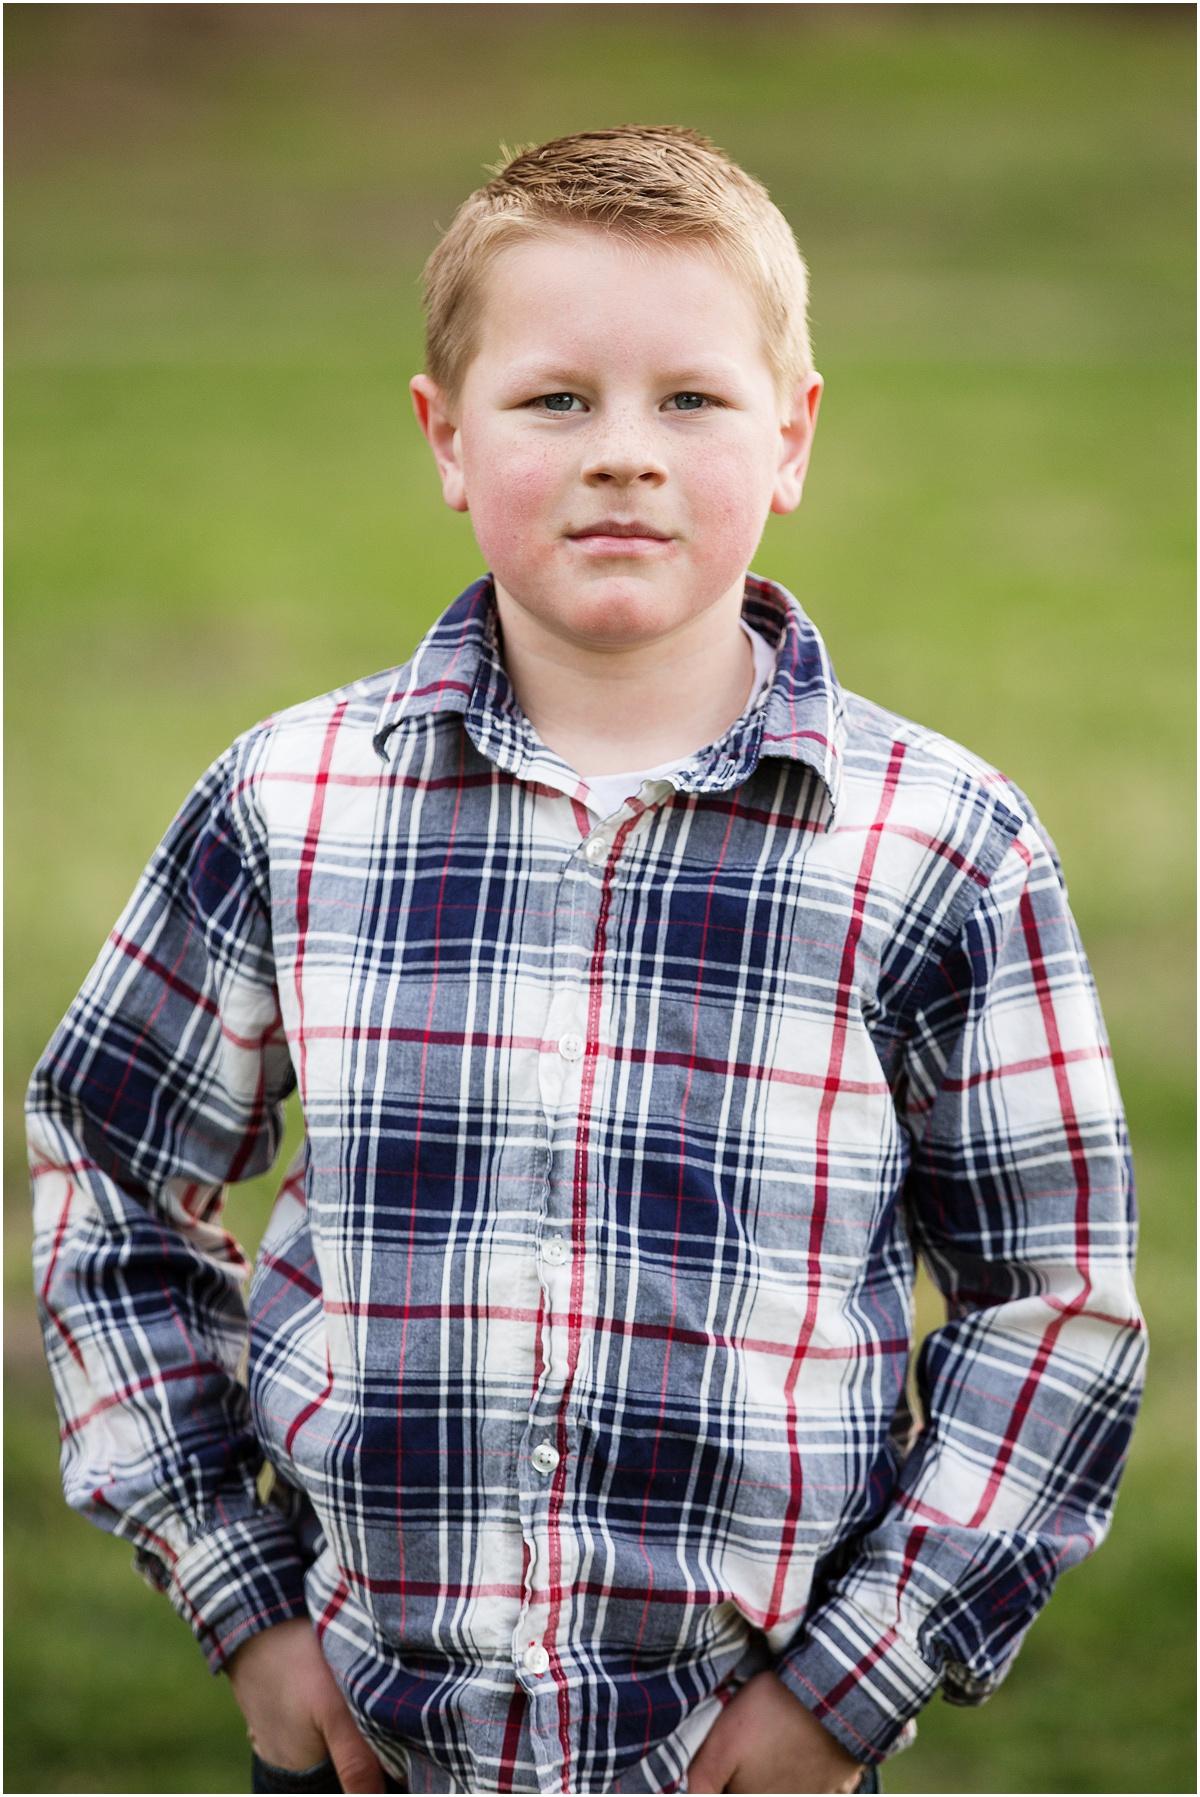 Portraits_Child Photography_Meridian Idaho__Leah Southwick Photography_0040.jpg